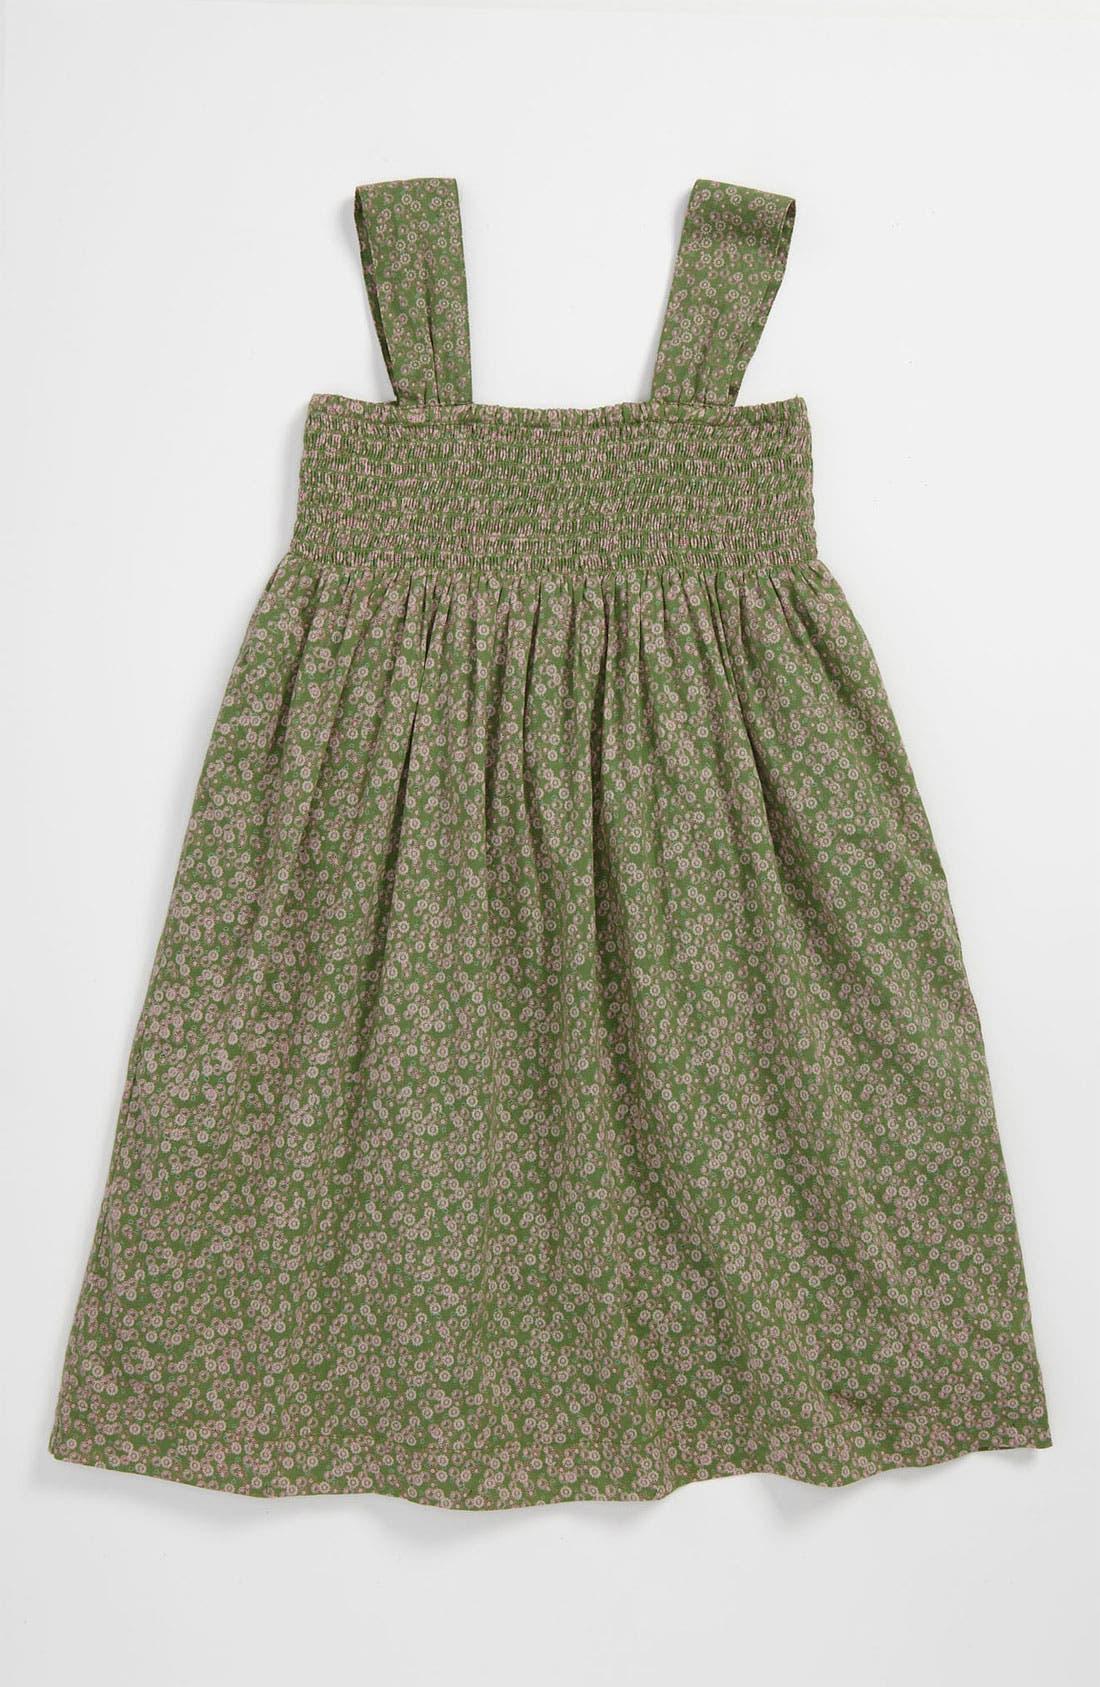 Alternate Image 1 Selected - Peek 'Camila' Dress (Toddler, Little Girls & Big Girls)